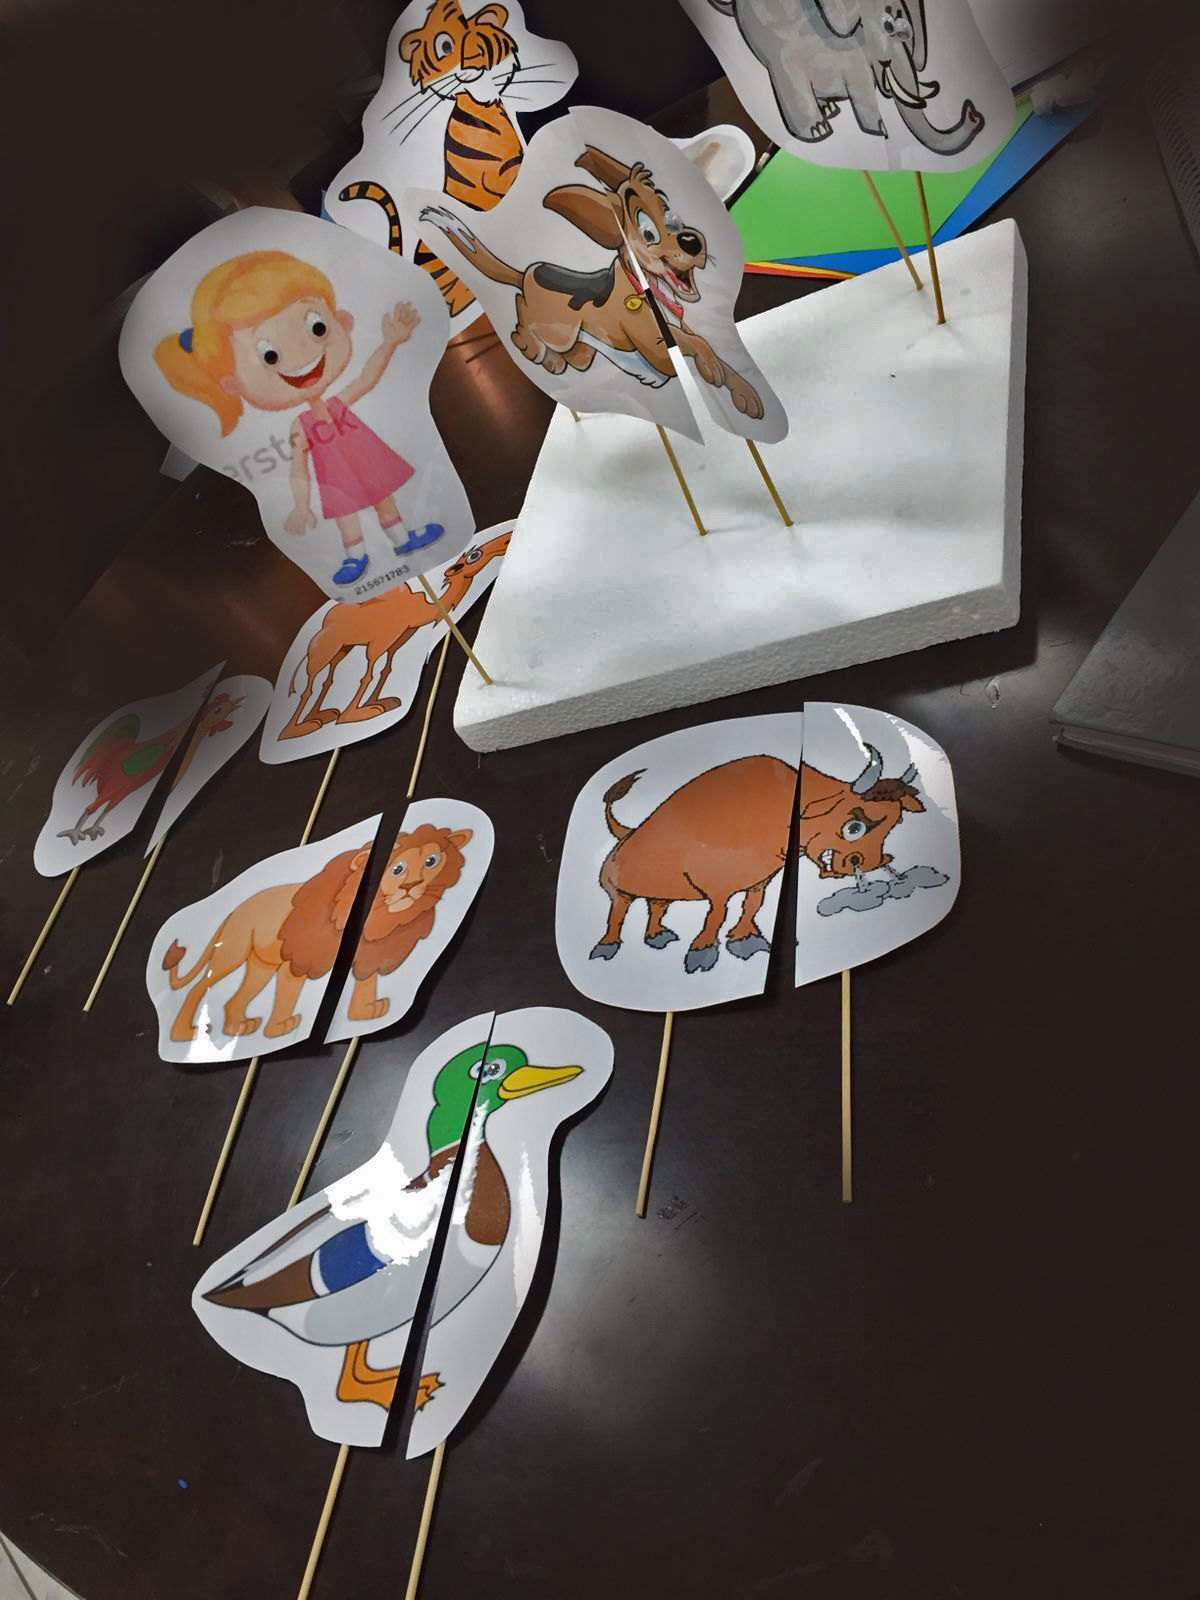 Sumayahkawther تشرح المعلمة درس الاستهلال والقافية للأطفال مستعينة بوسيلة الحيوانات وهي عبارة عن اولا Background Design Vector Busy Book Background Design